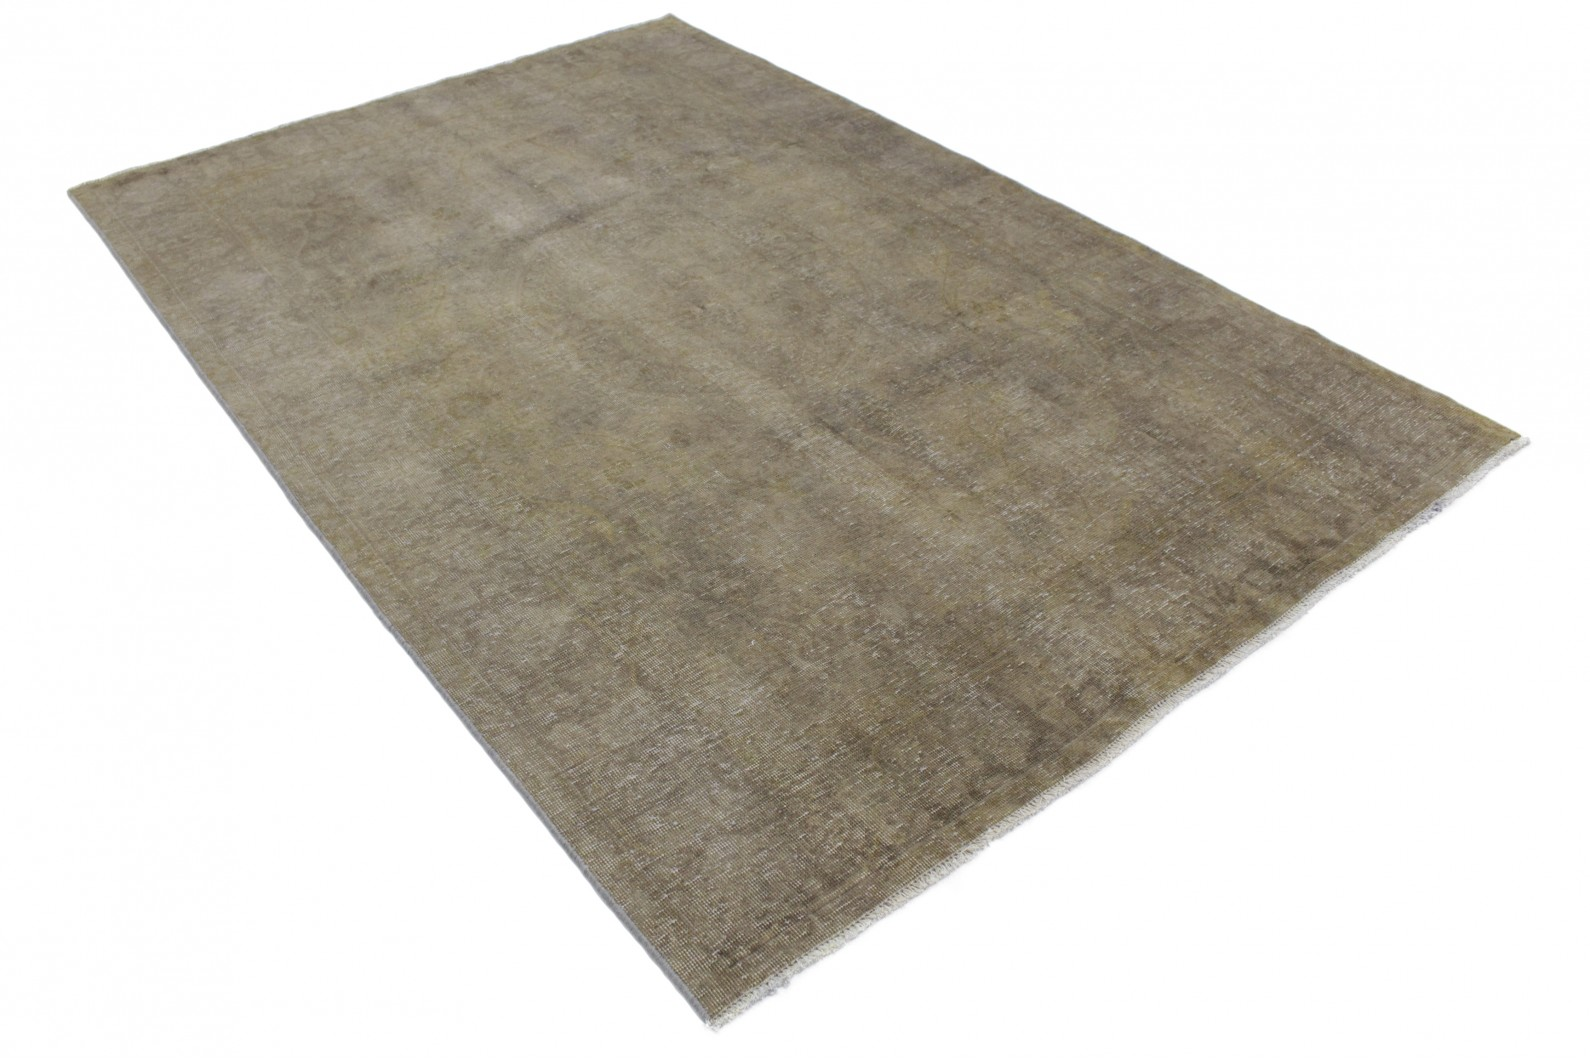 vintage teppich beige grau in 290x190 1001 177292 bei. Black Bedroom Furniture Sets. Home Design Ideas